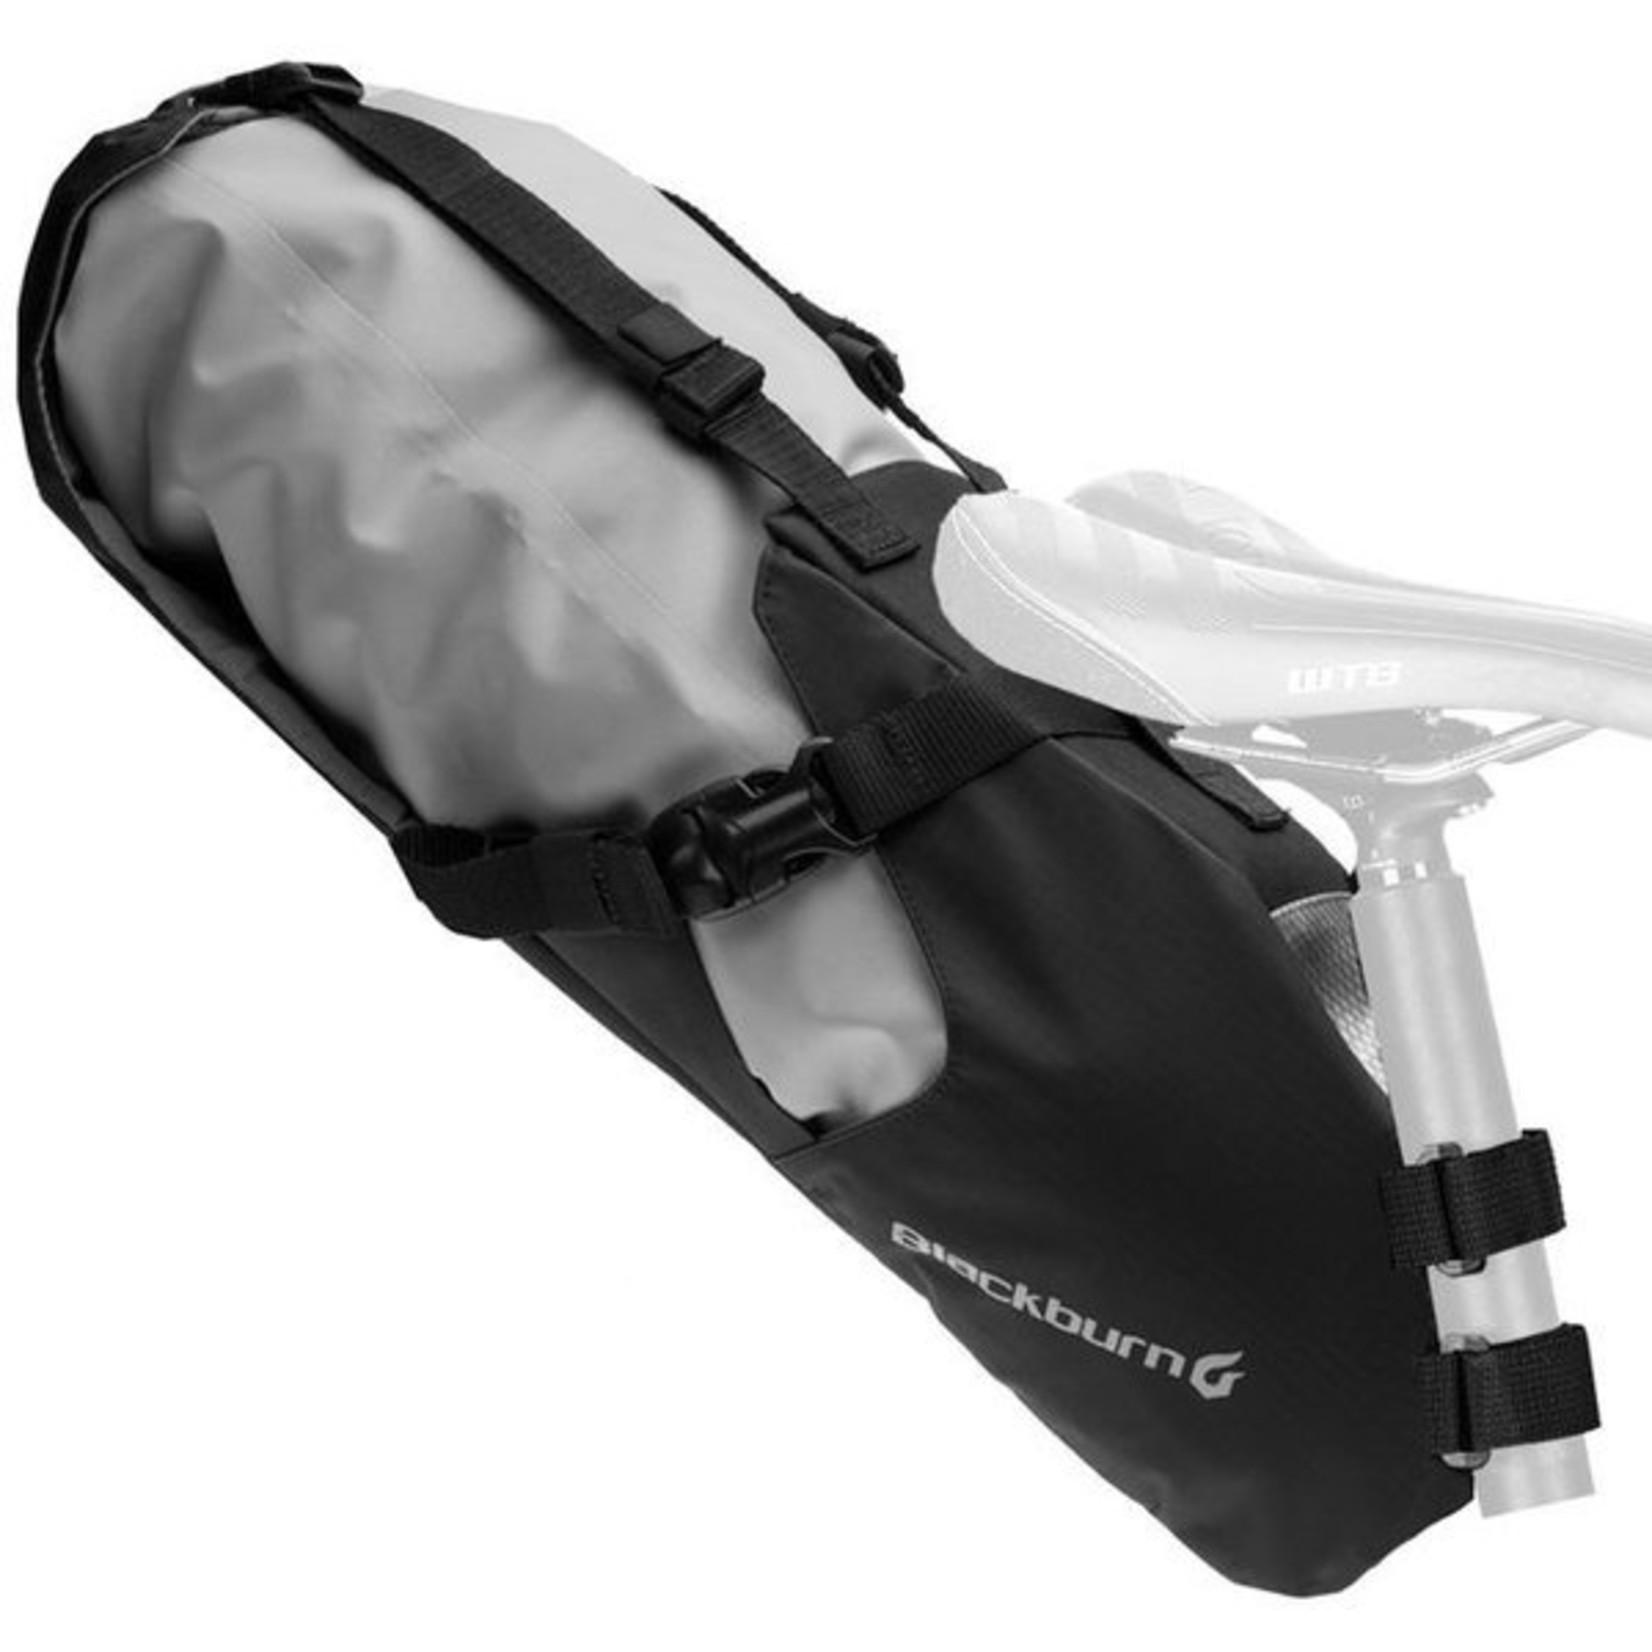 Blackburn Blackburn Outpost Seat Pack (with dry bag), 10.5L